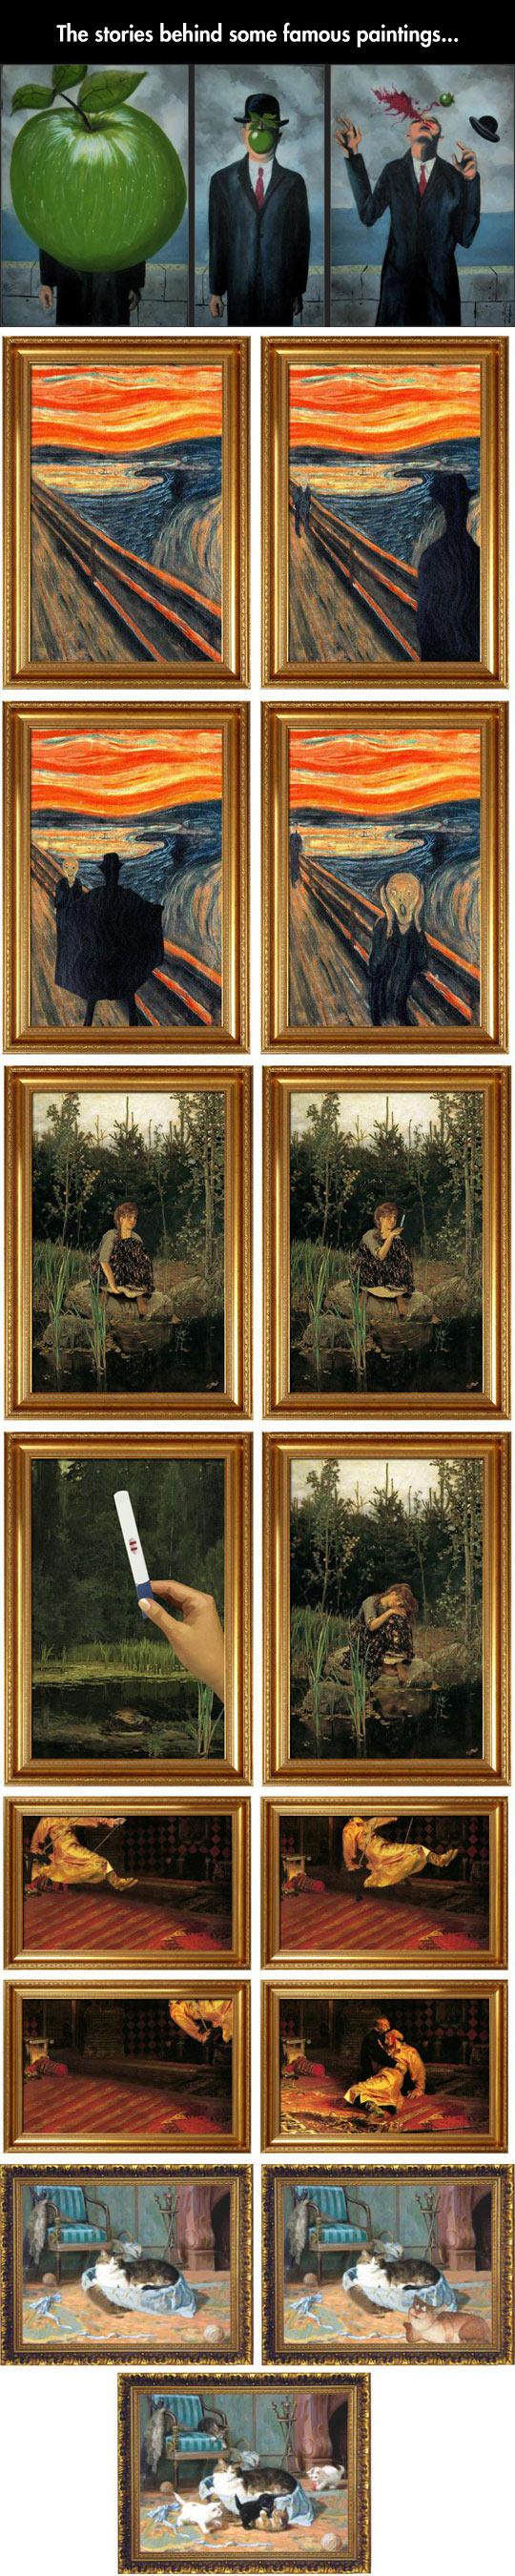 Stories Behind The Paintings